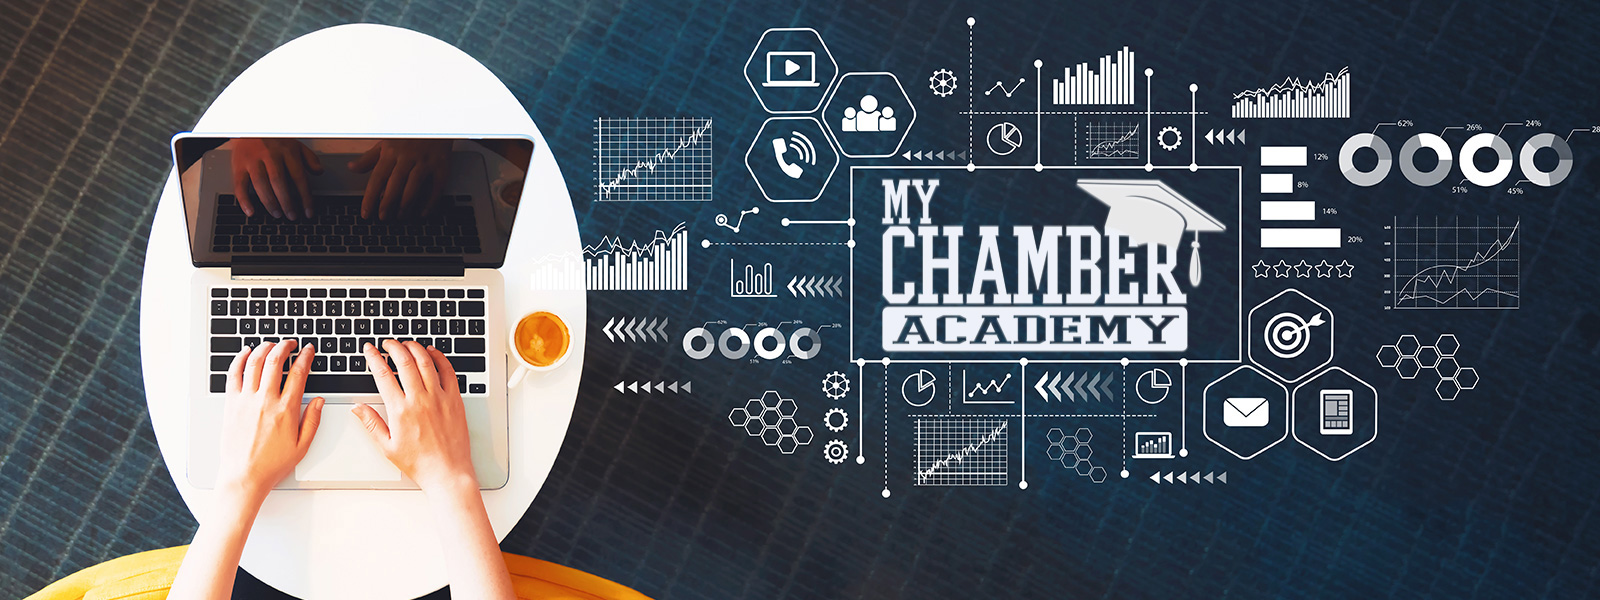 My Chamber Academy